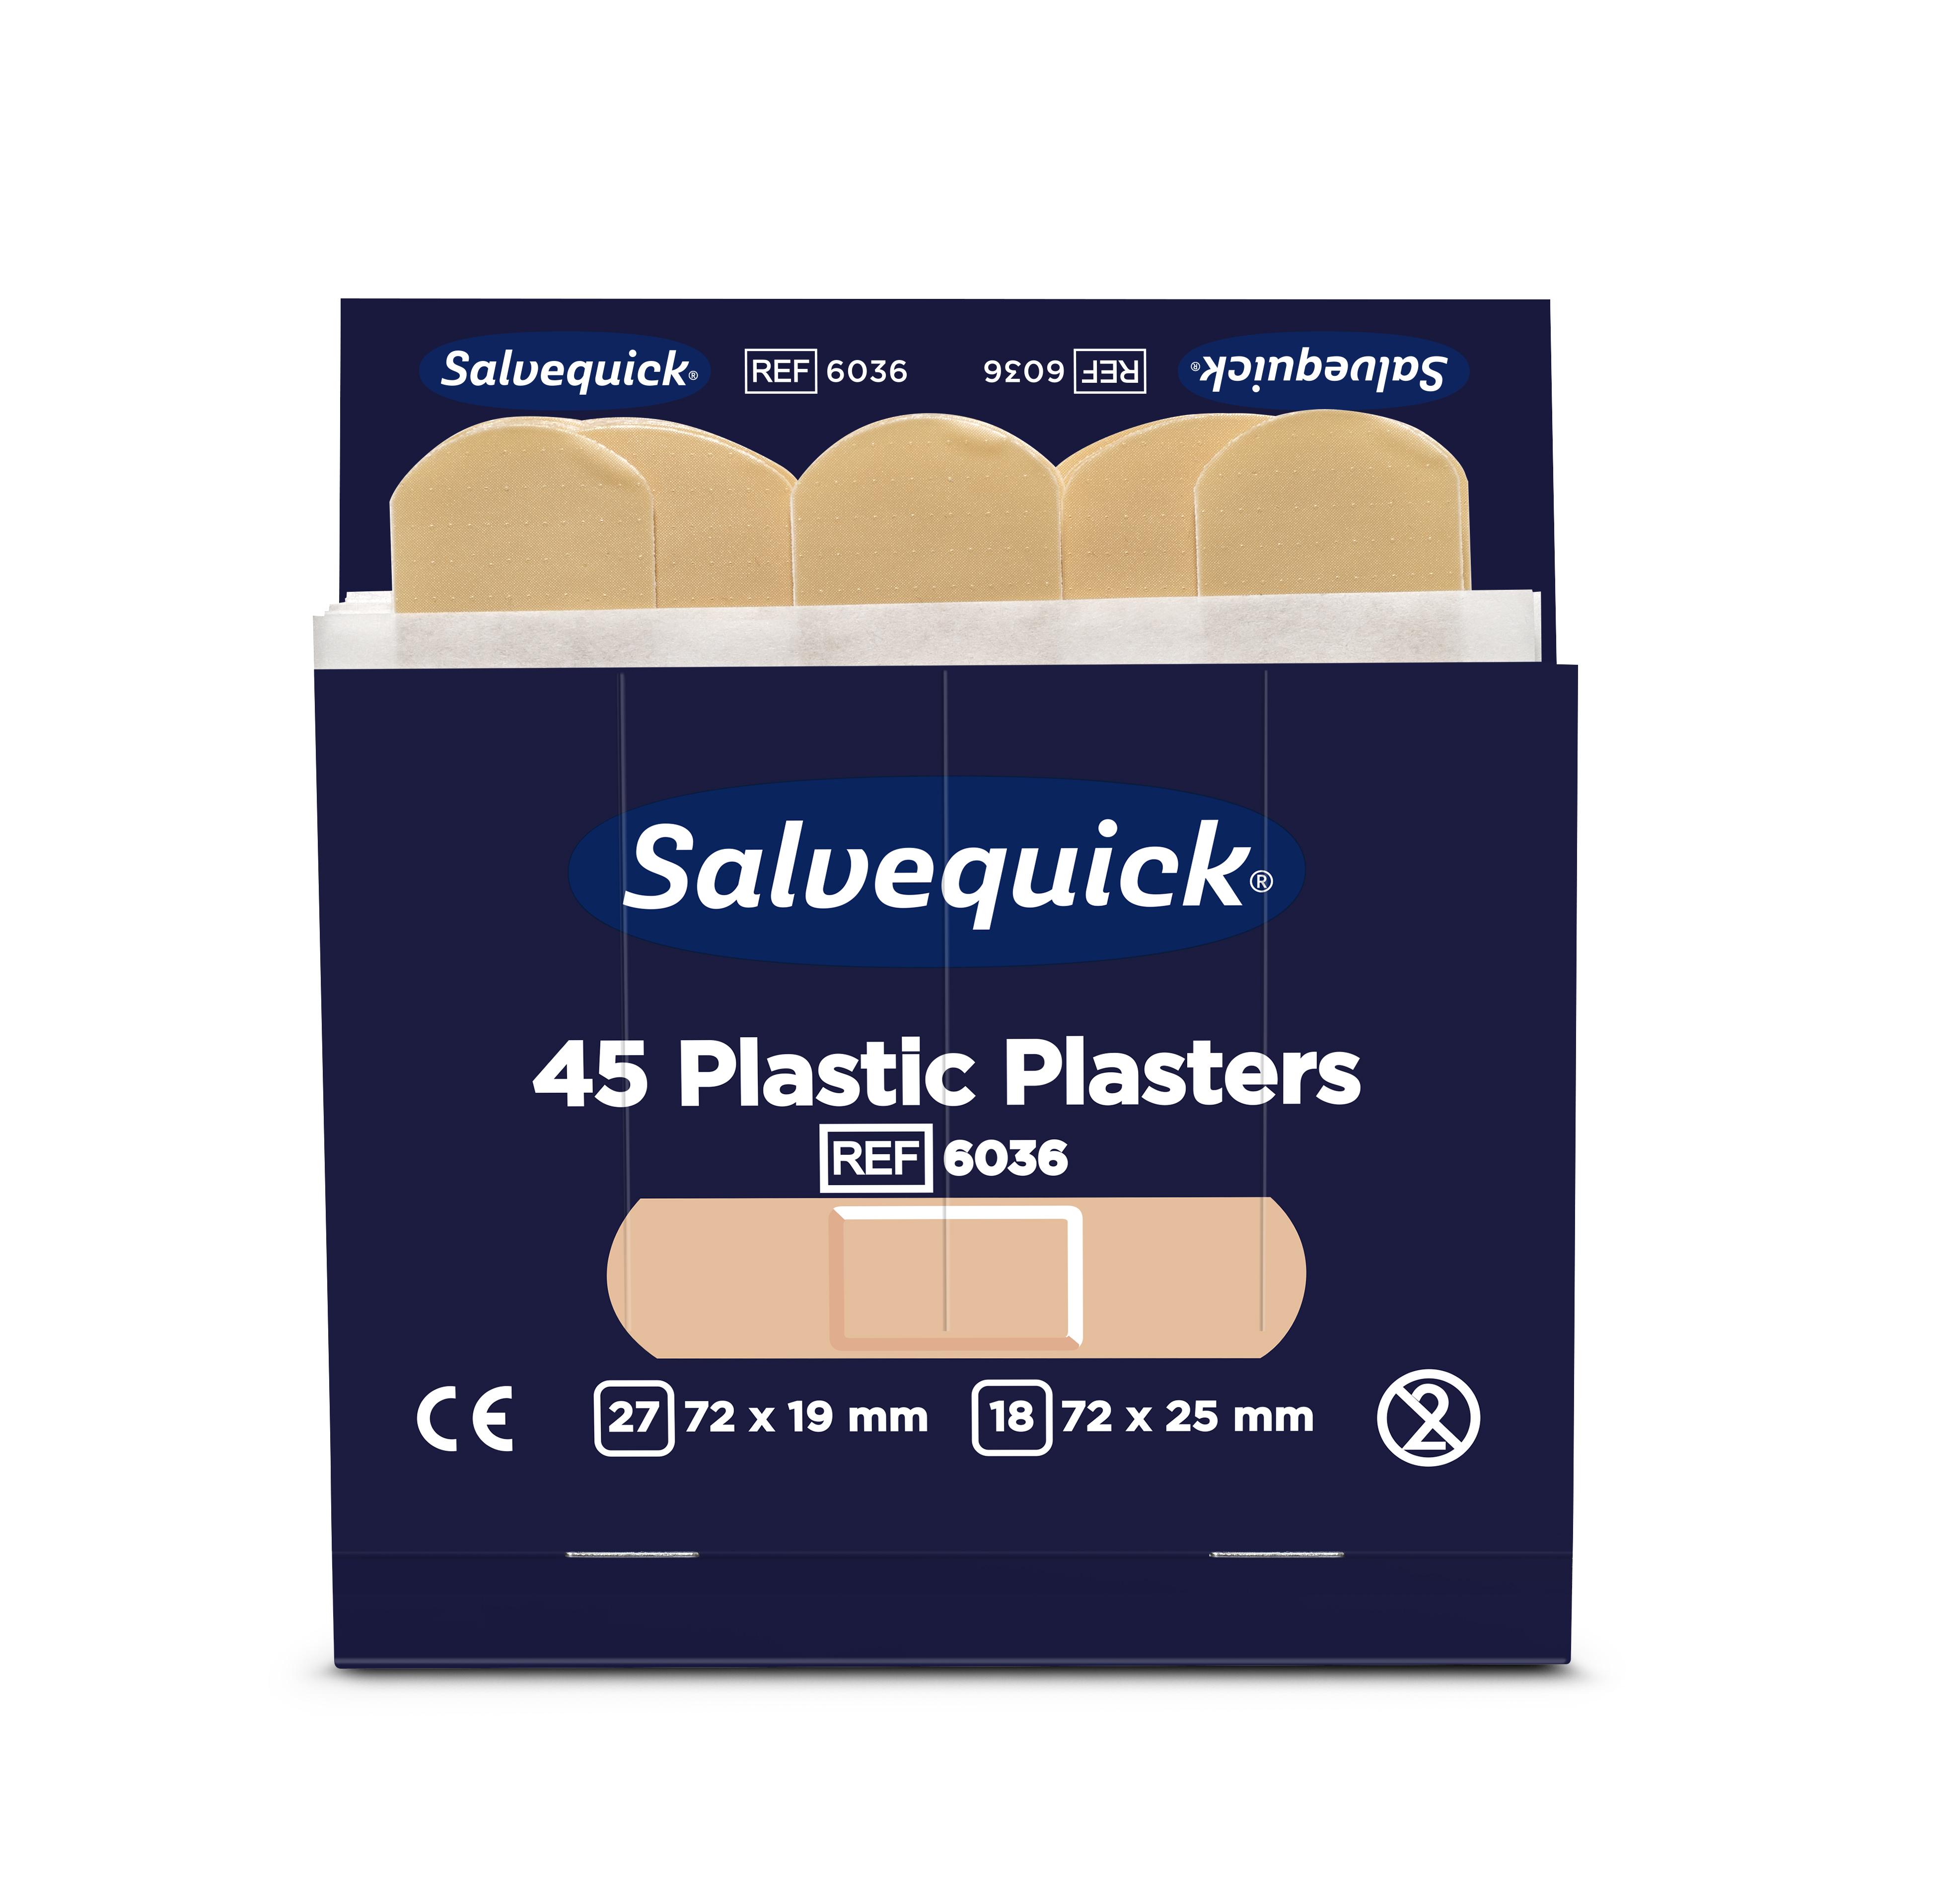 Cederroth Salvequick Plastic Pflaster - 45 Stück Pflaster